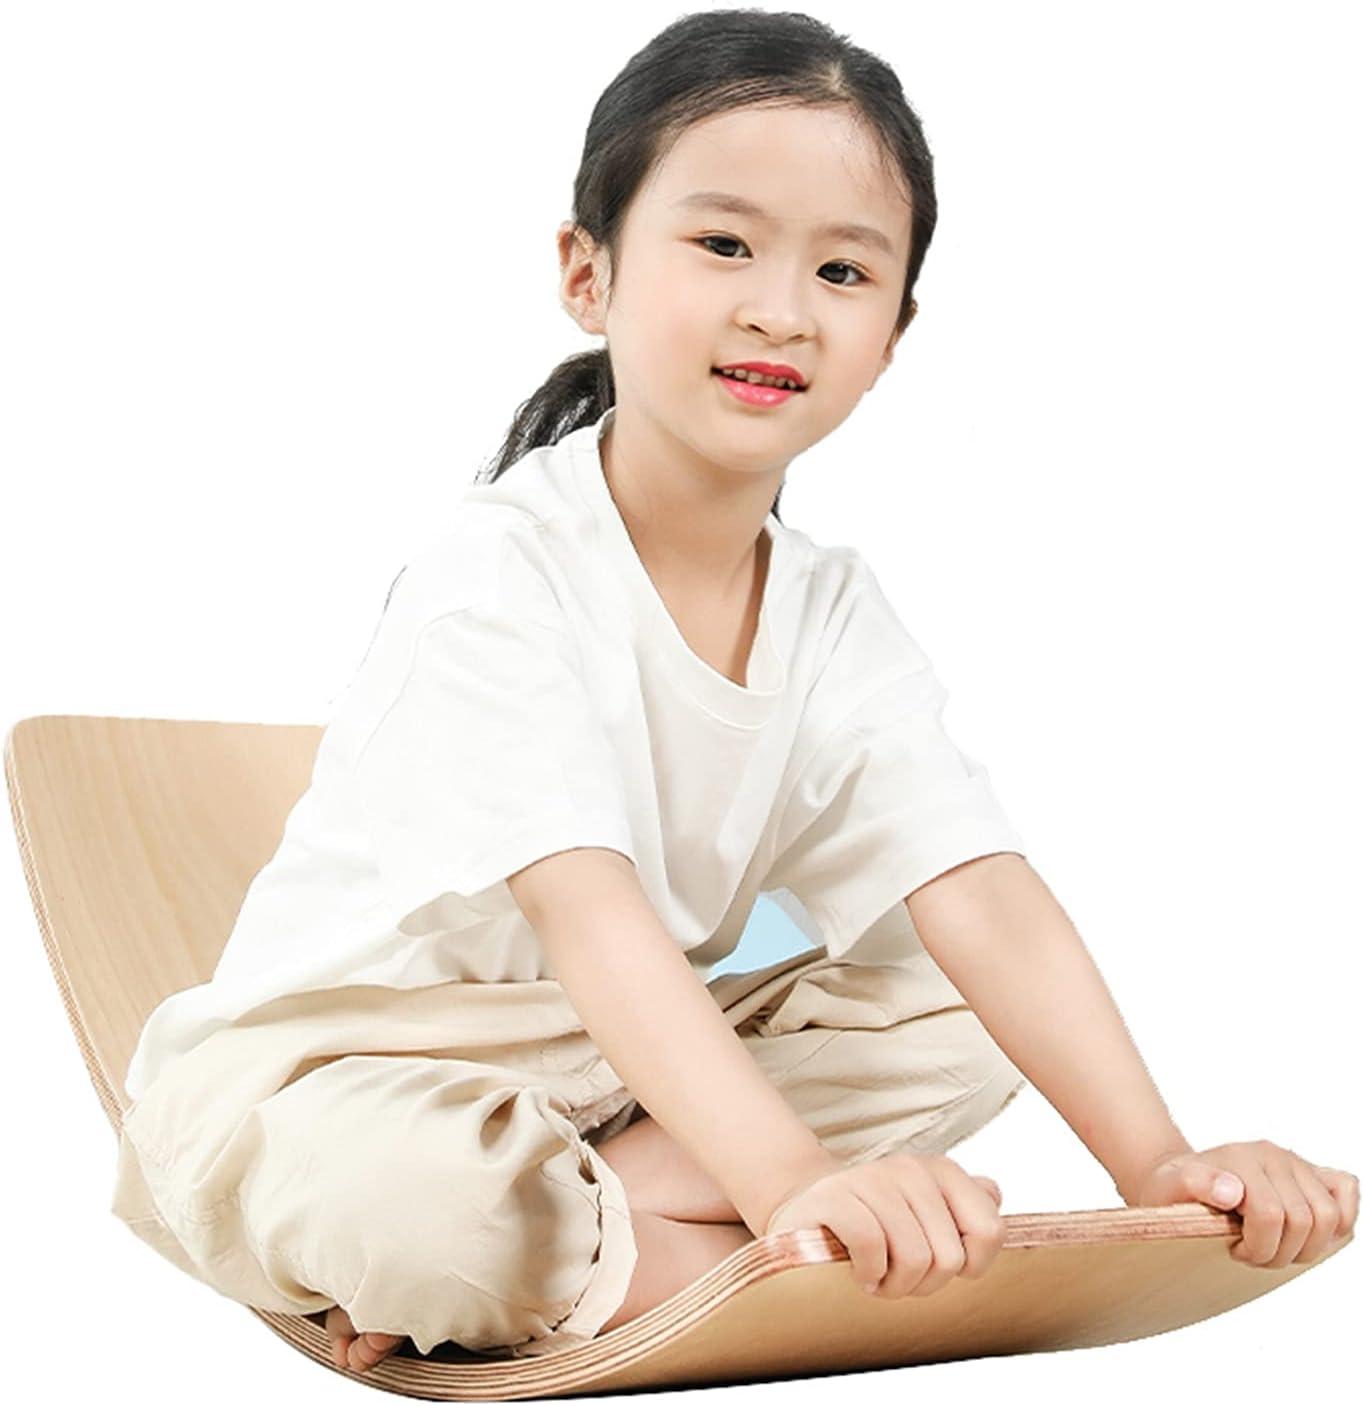 ZXQZ Wooden Wobble Balance Max 65% OFF Board W Curvy Popular popular Children's Yoga